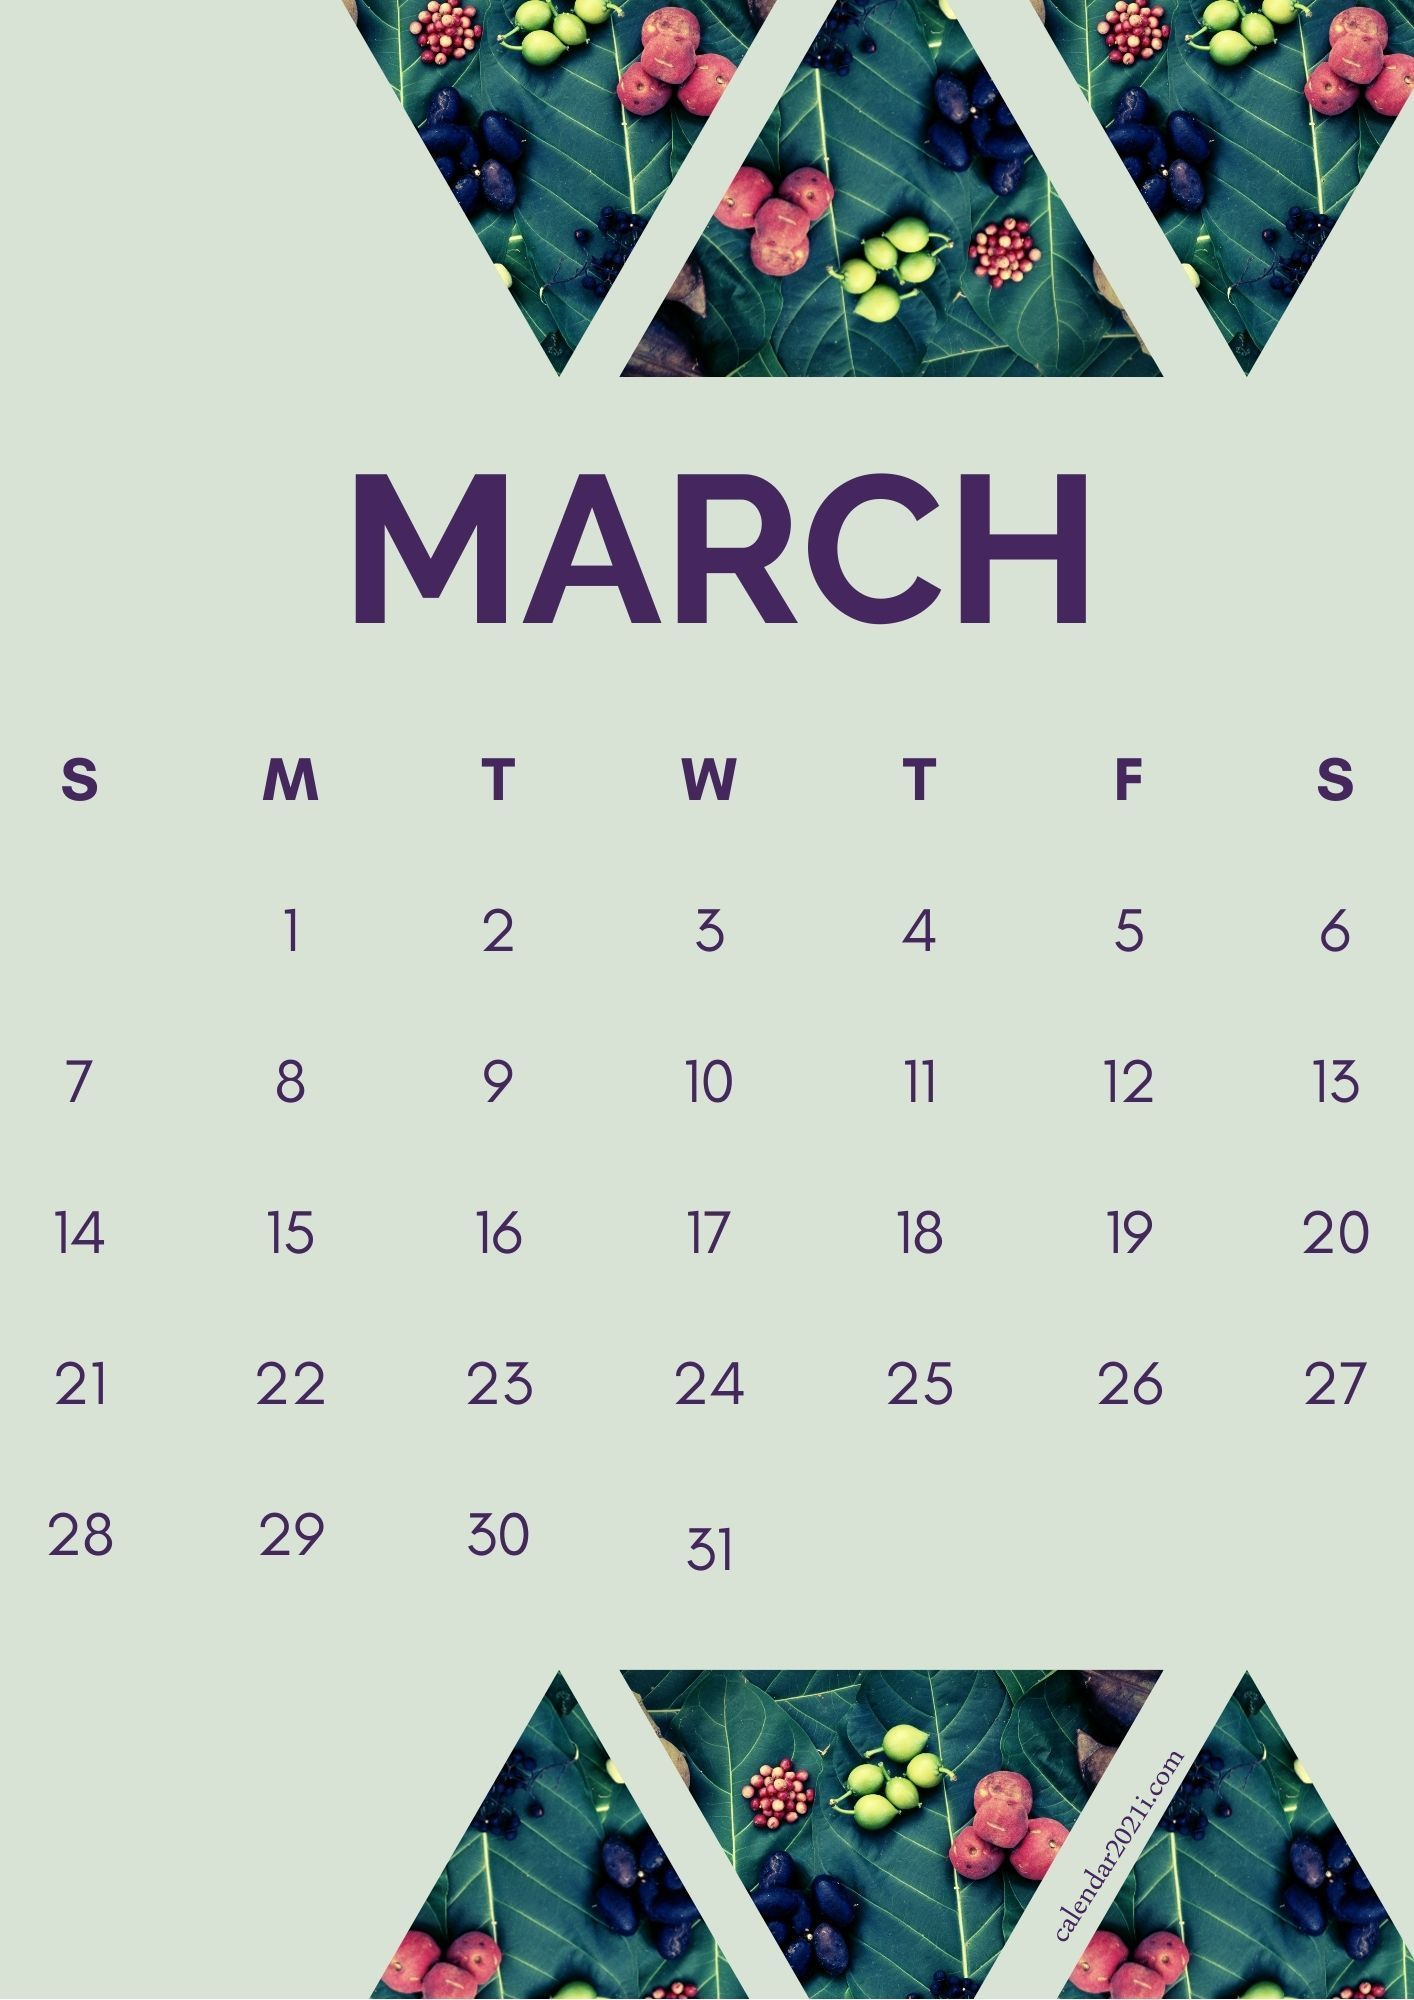 Decorative March 2021 Flower Calendar Printable